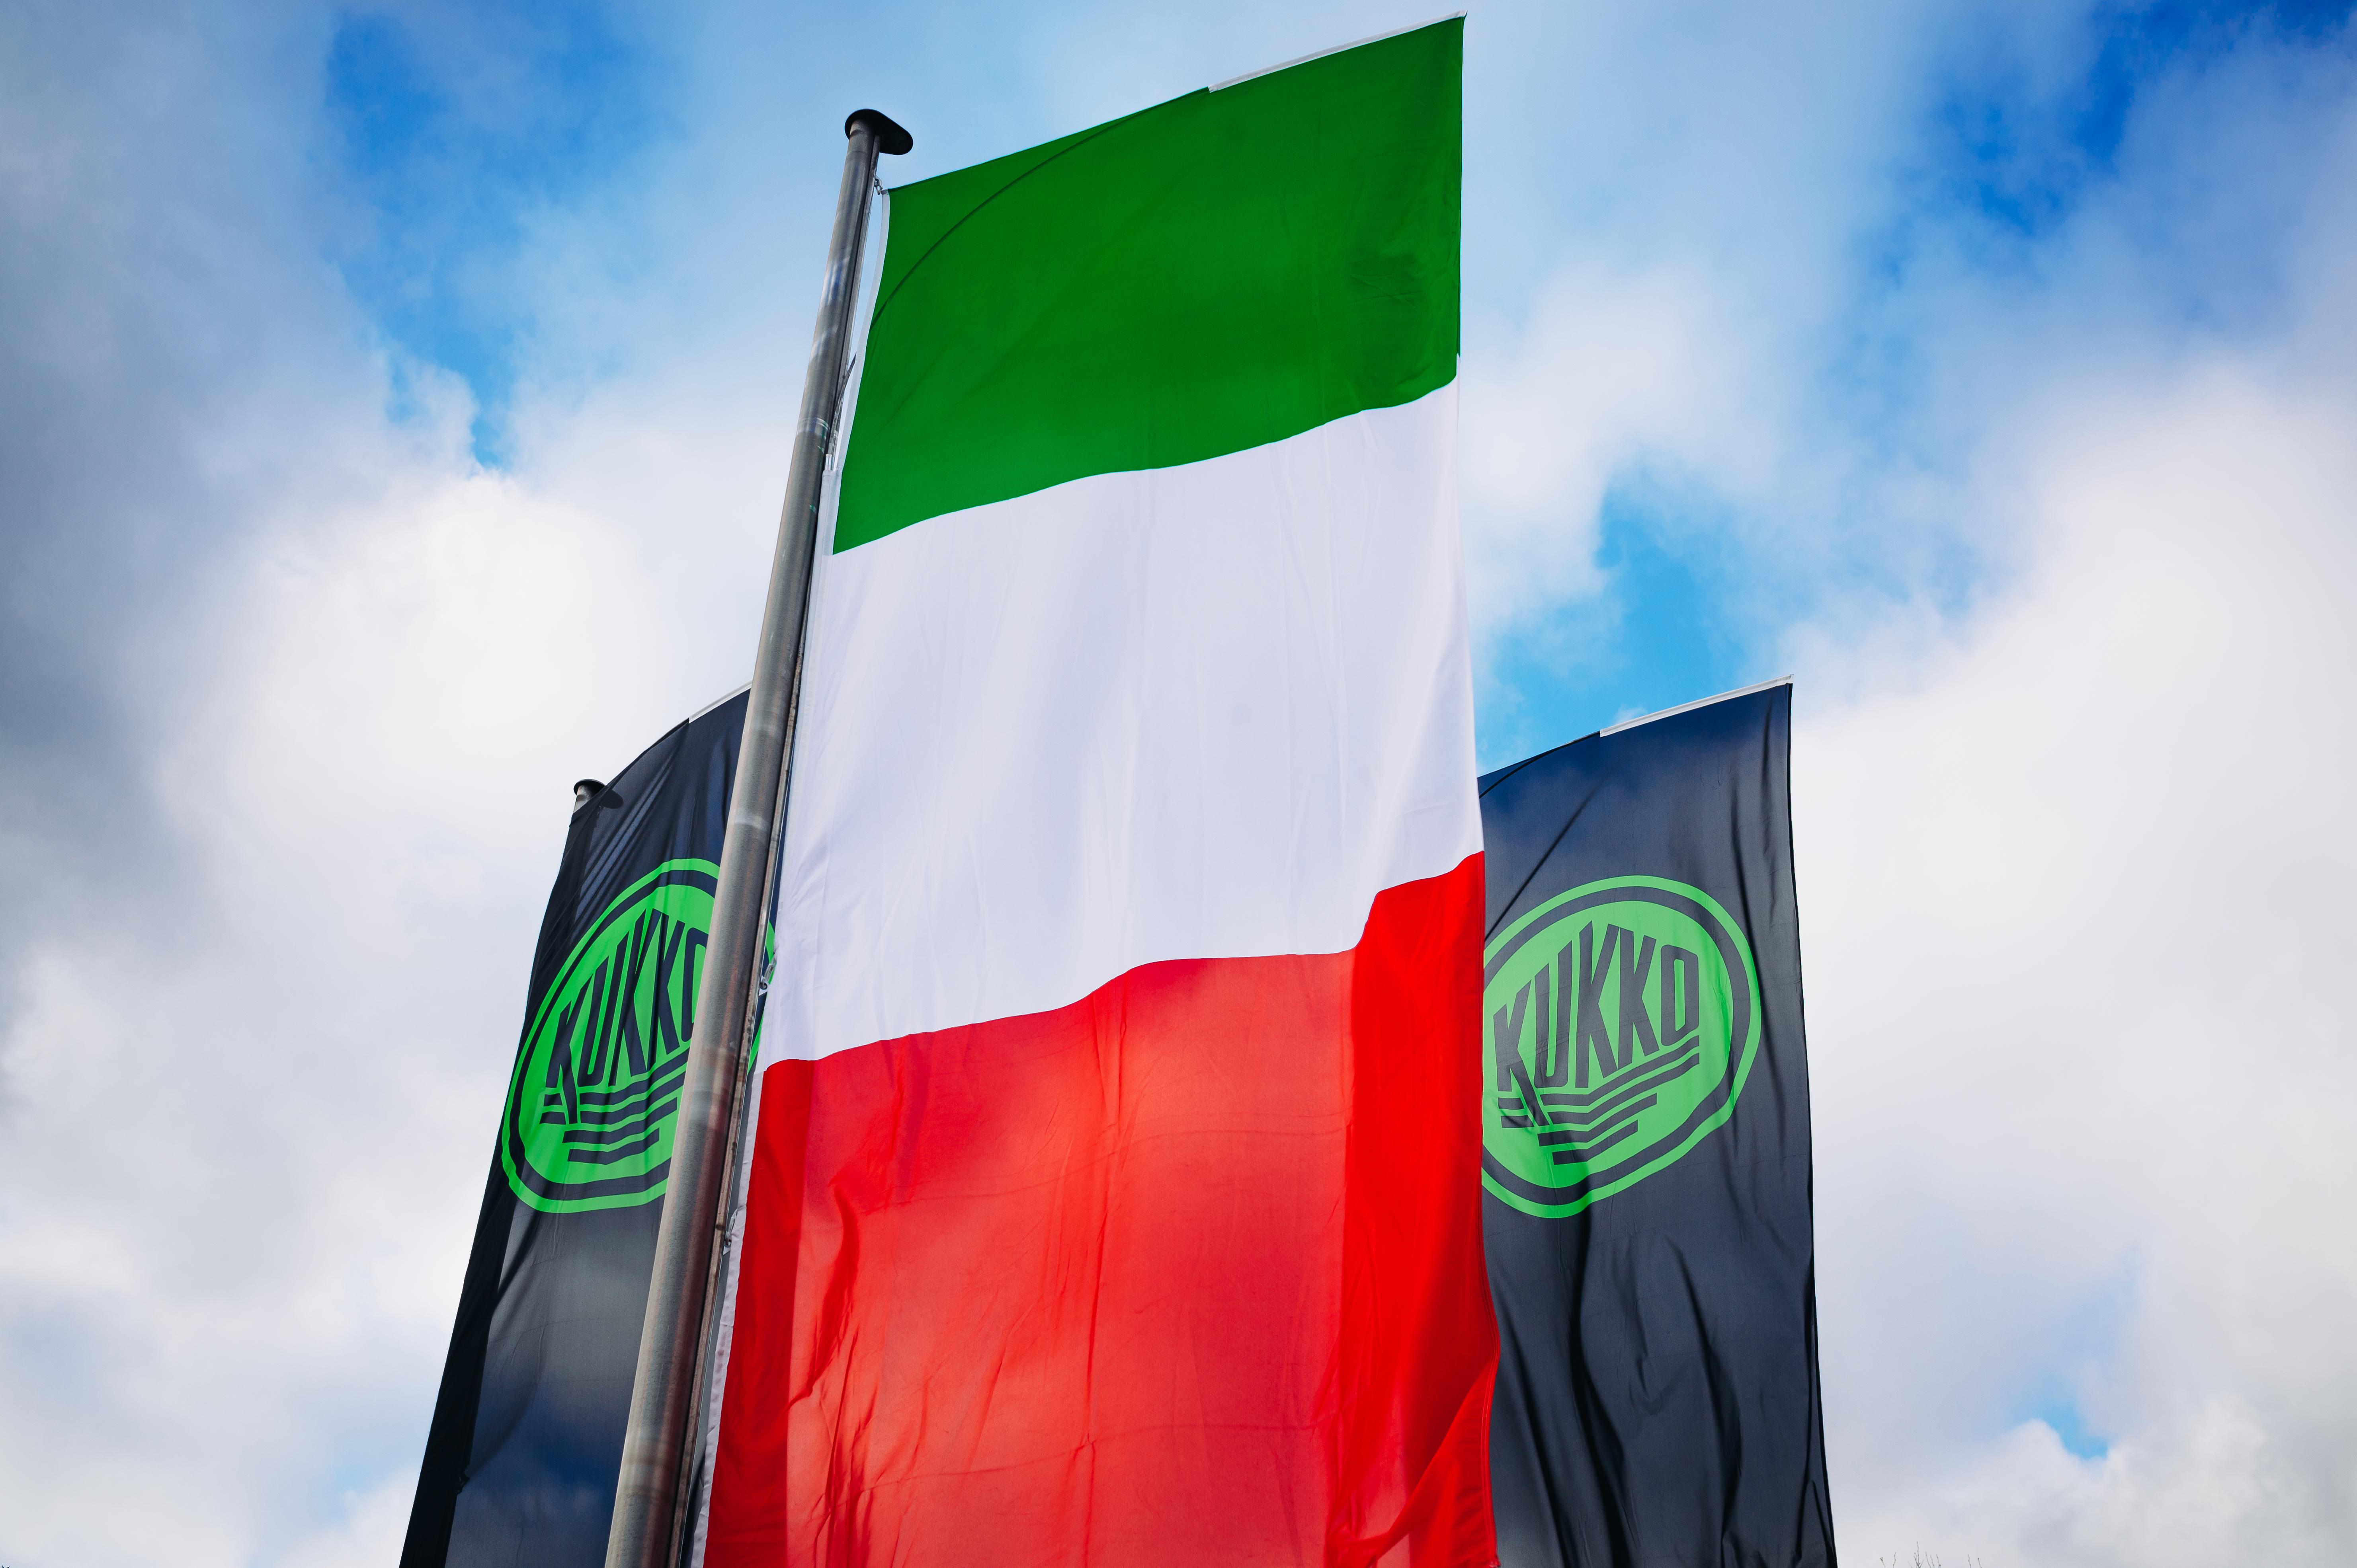 KUKKO Italia S.R.L.